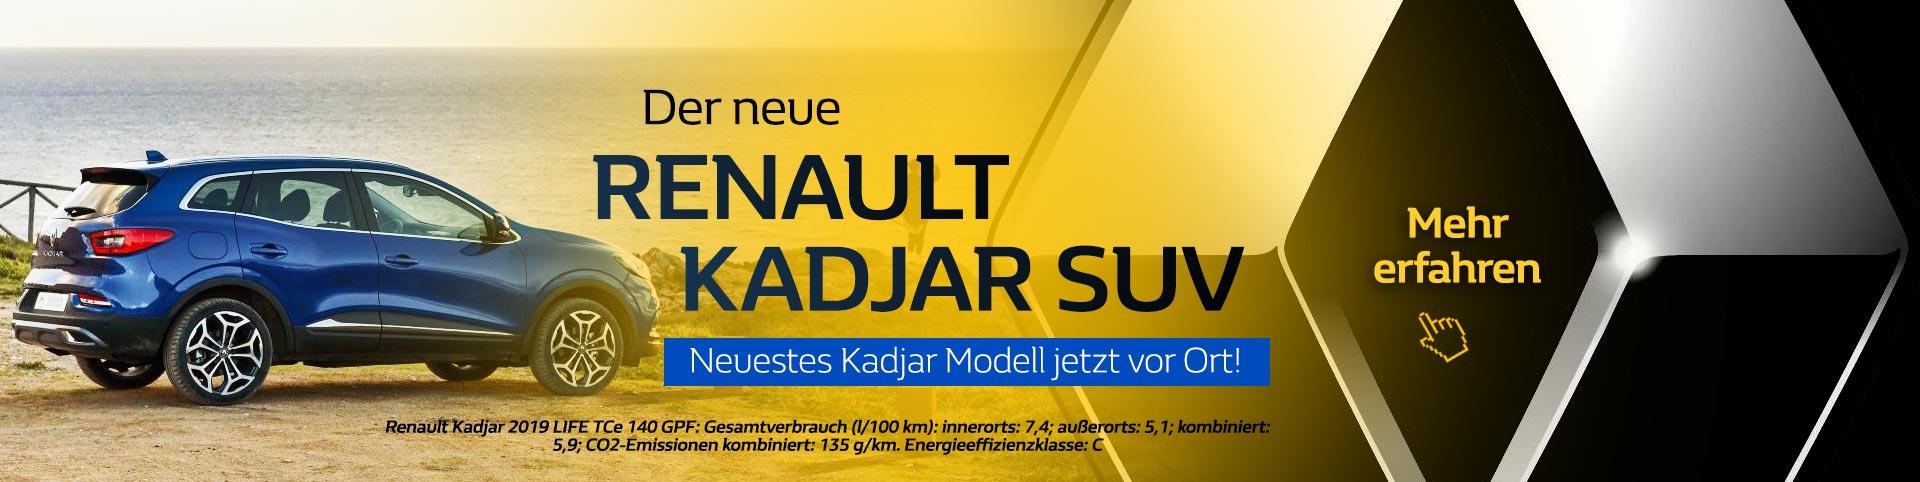 Renault Kadjar Premiere 2019